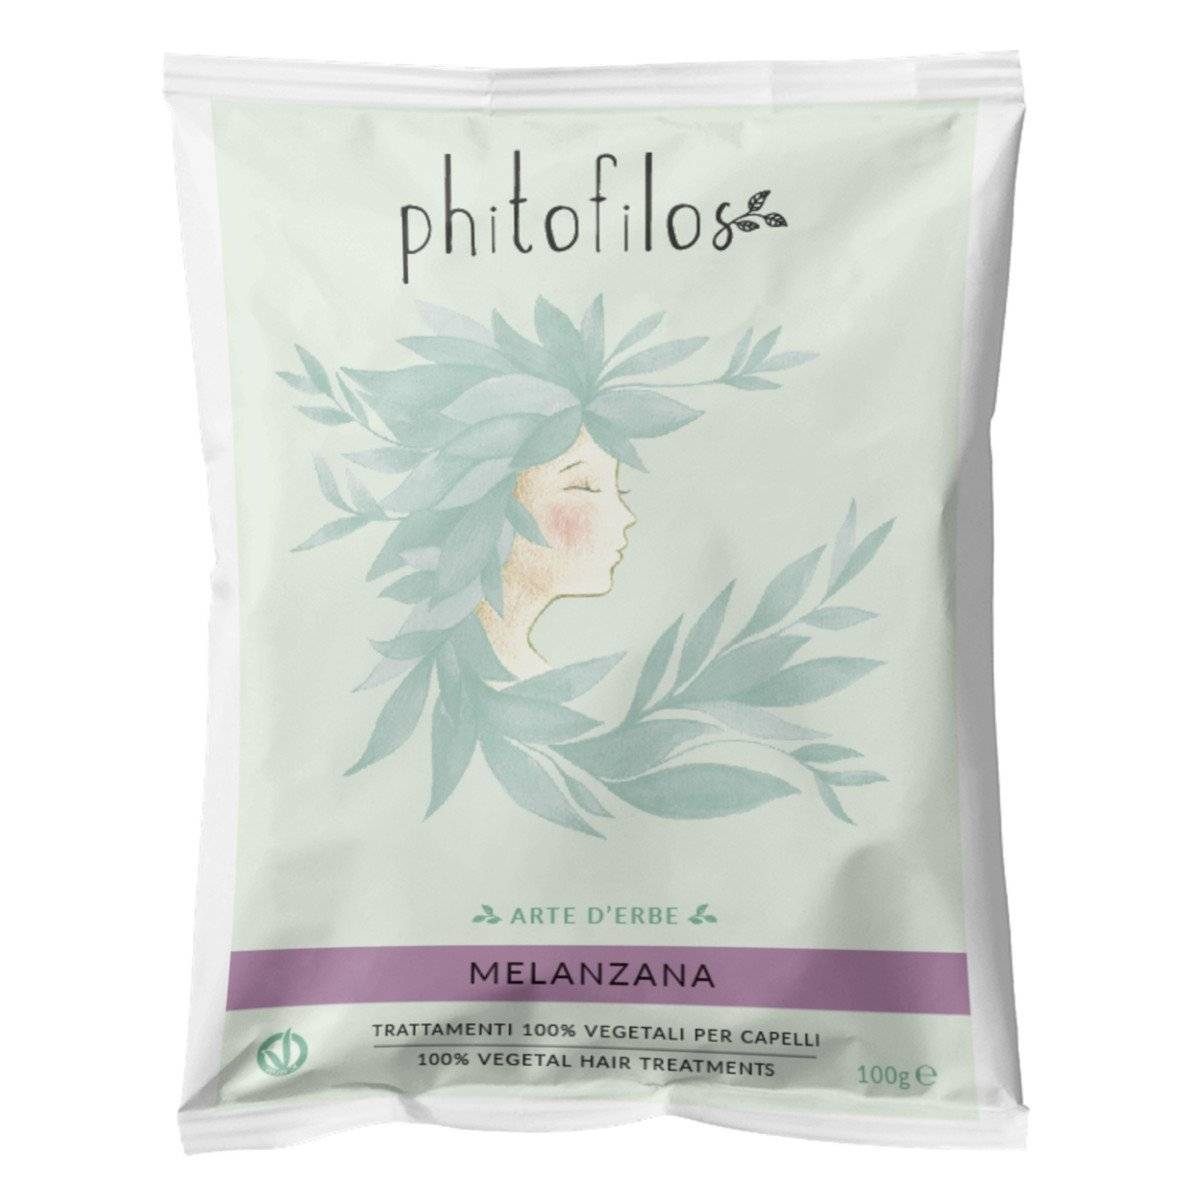 Aubergine natural hair dye Phitofilos